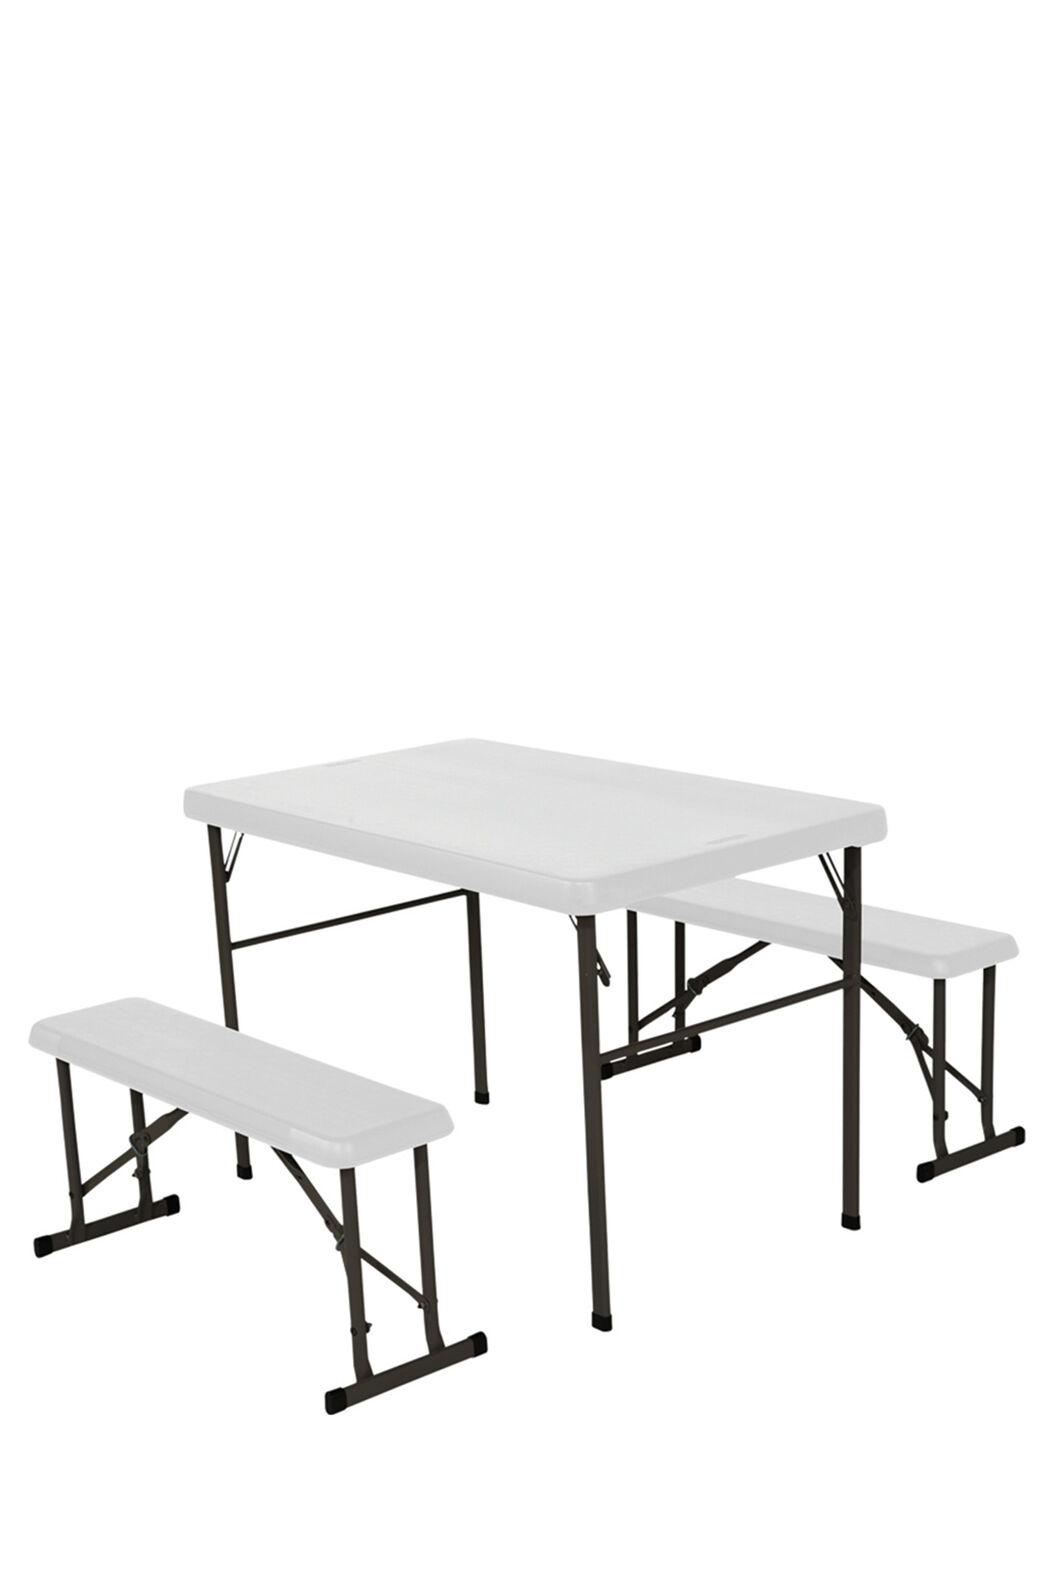 Lifetime Sports Blow Mould Table, None, hi-res